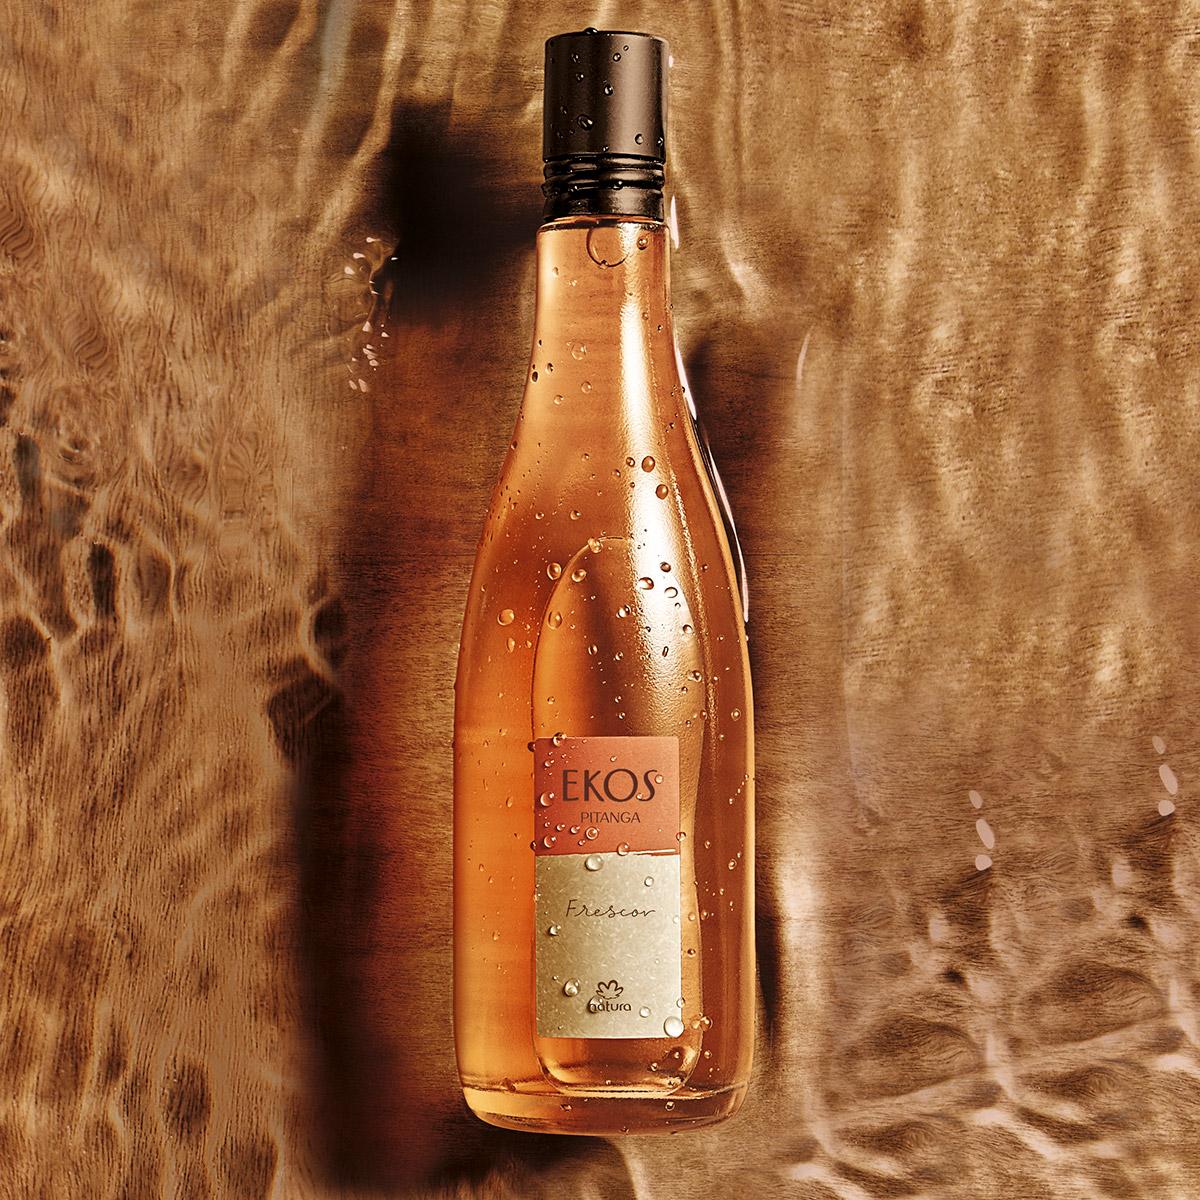 Desodorante Colônia Frescor Feminino Ekos Pitanga - 150ml - 58417